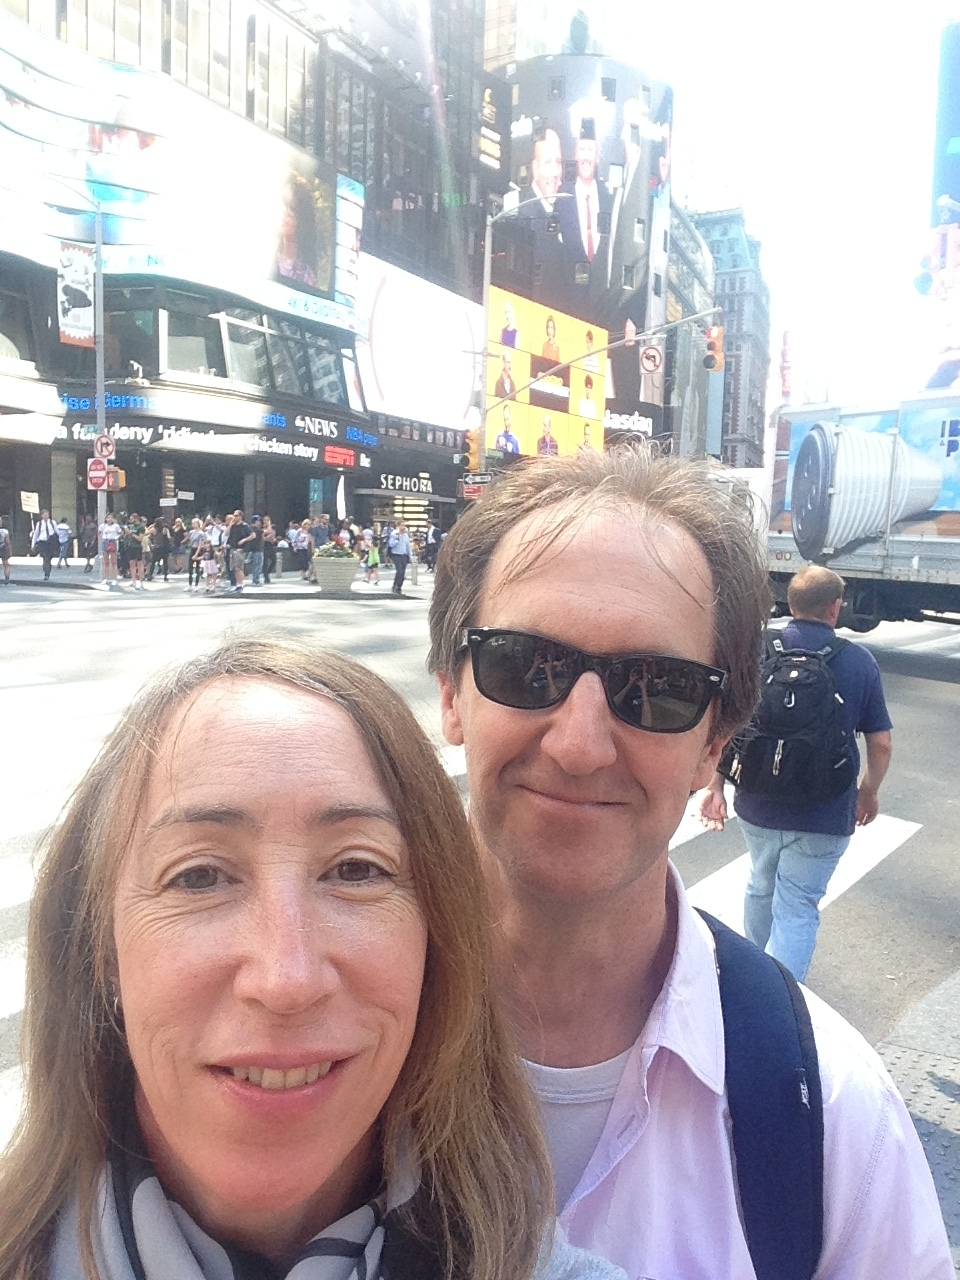 ^ Still Times Square